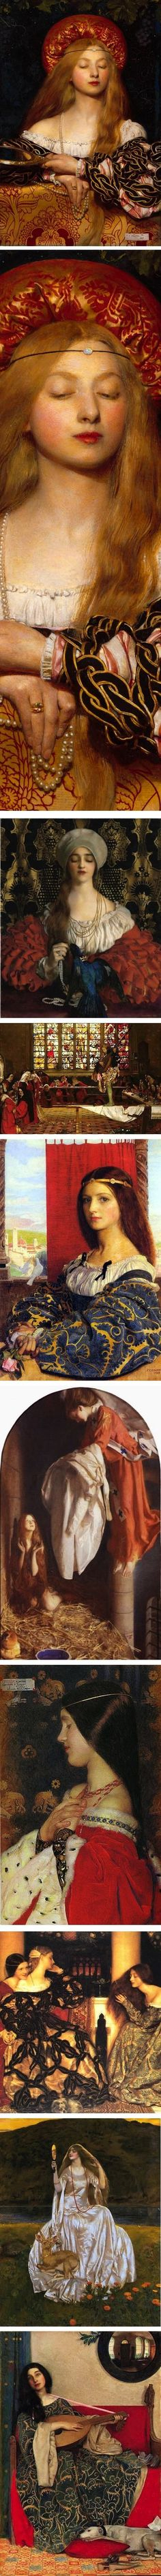 Frank Cadogan Cowper, the last Pre-Raphaelite